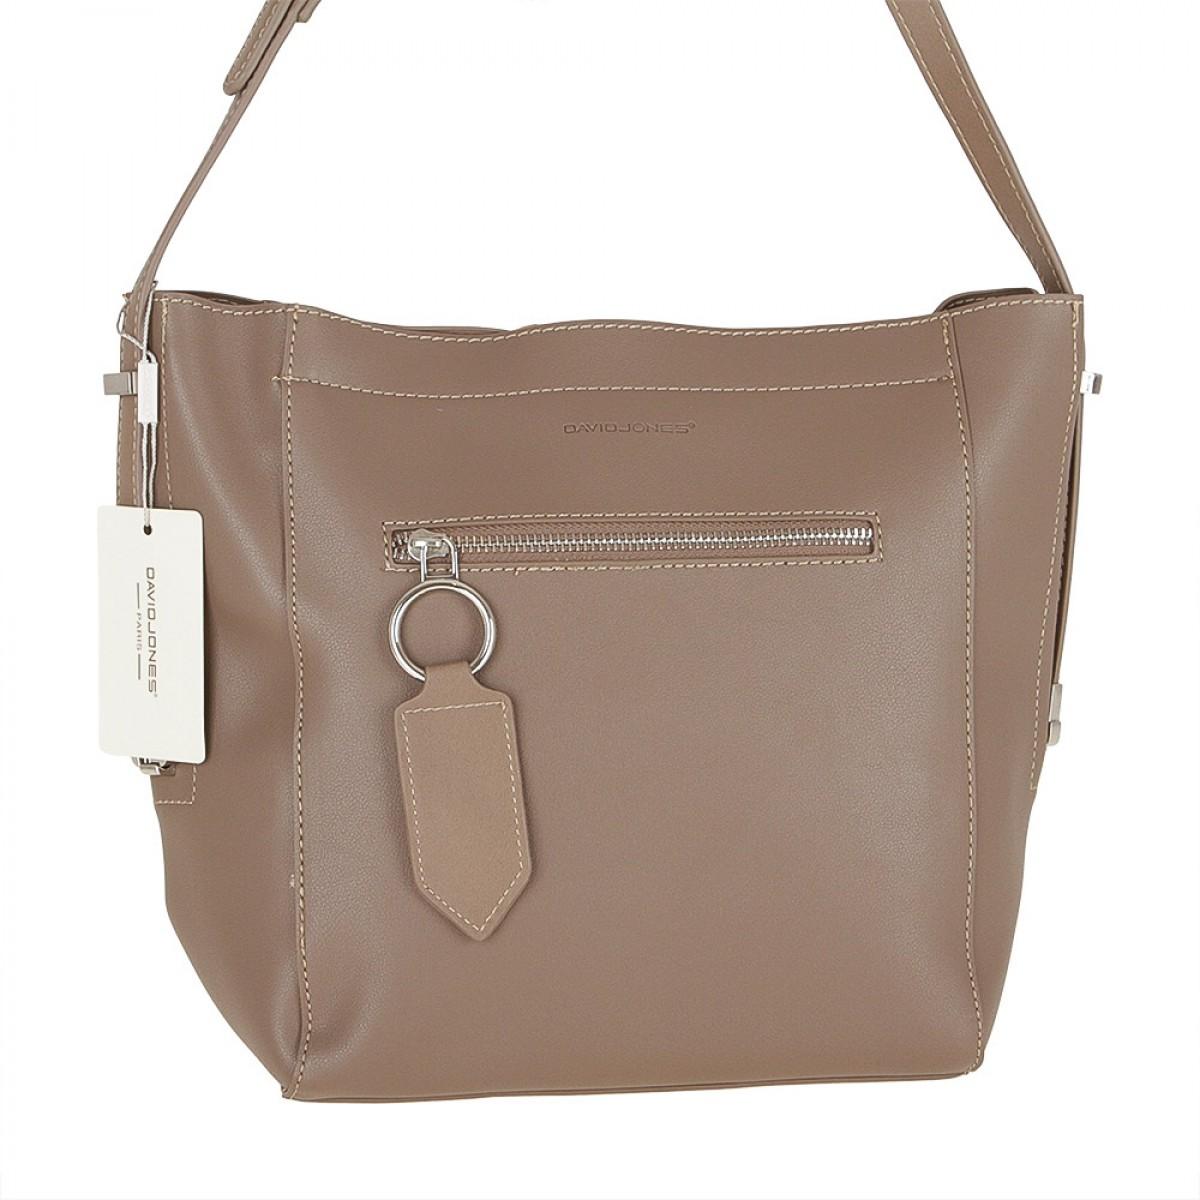 Жіноча сумка David Jones 5669-1 D.CAMEL